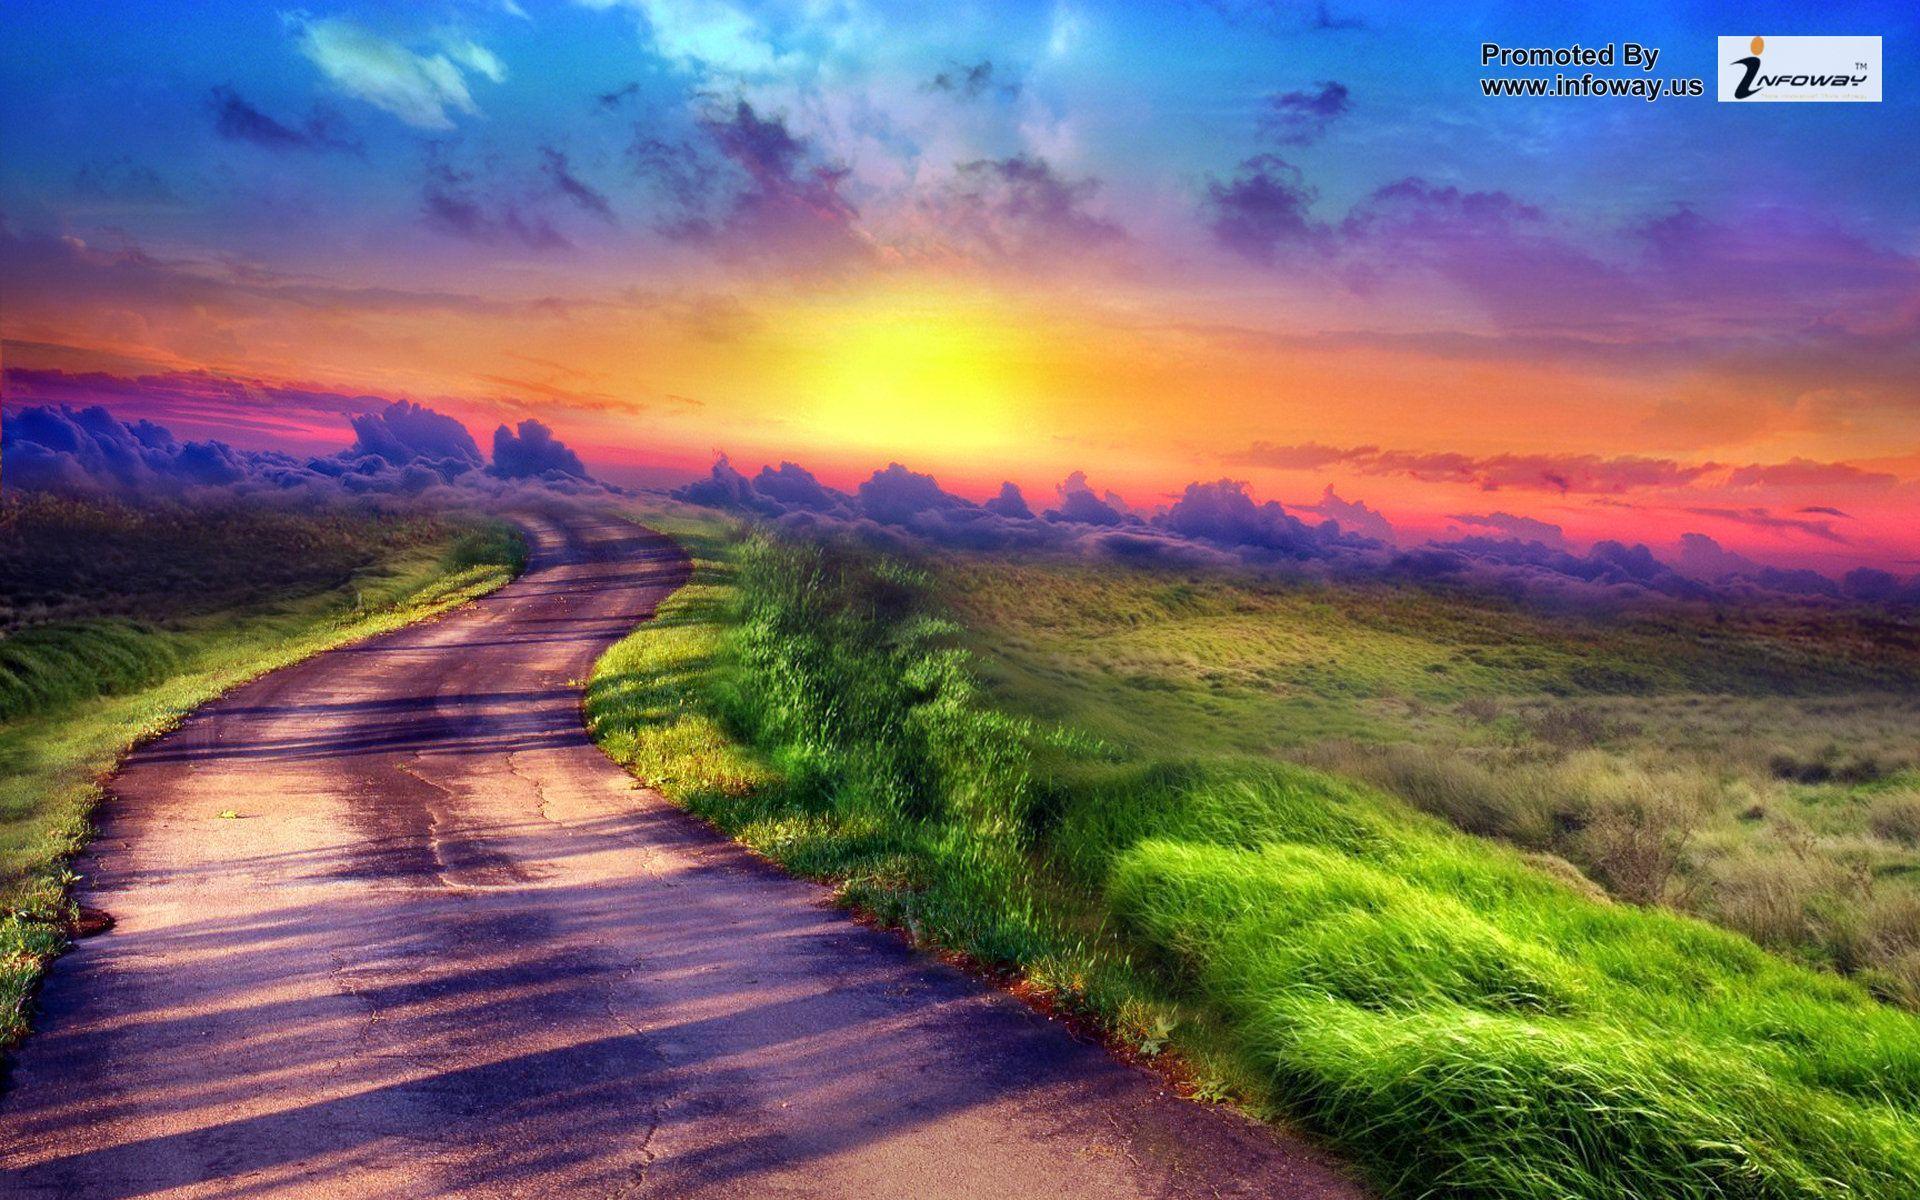 Beautiful Summer   Beautiful Summer Scenery Photo 44 of 413   outdoors   Landscape wallpaper ...